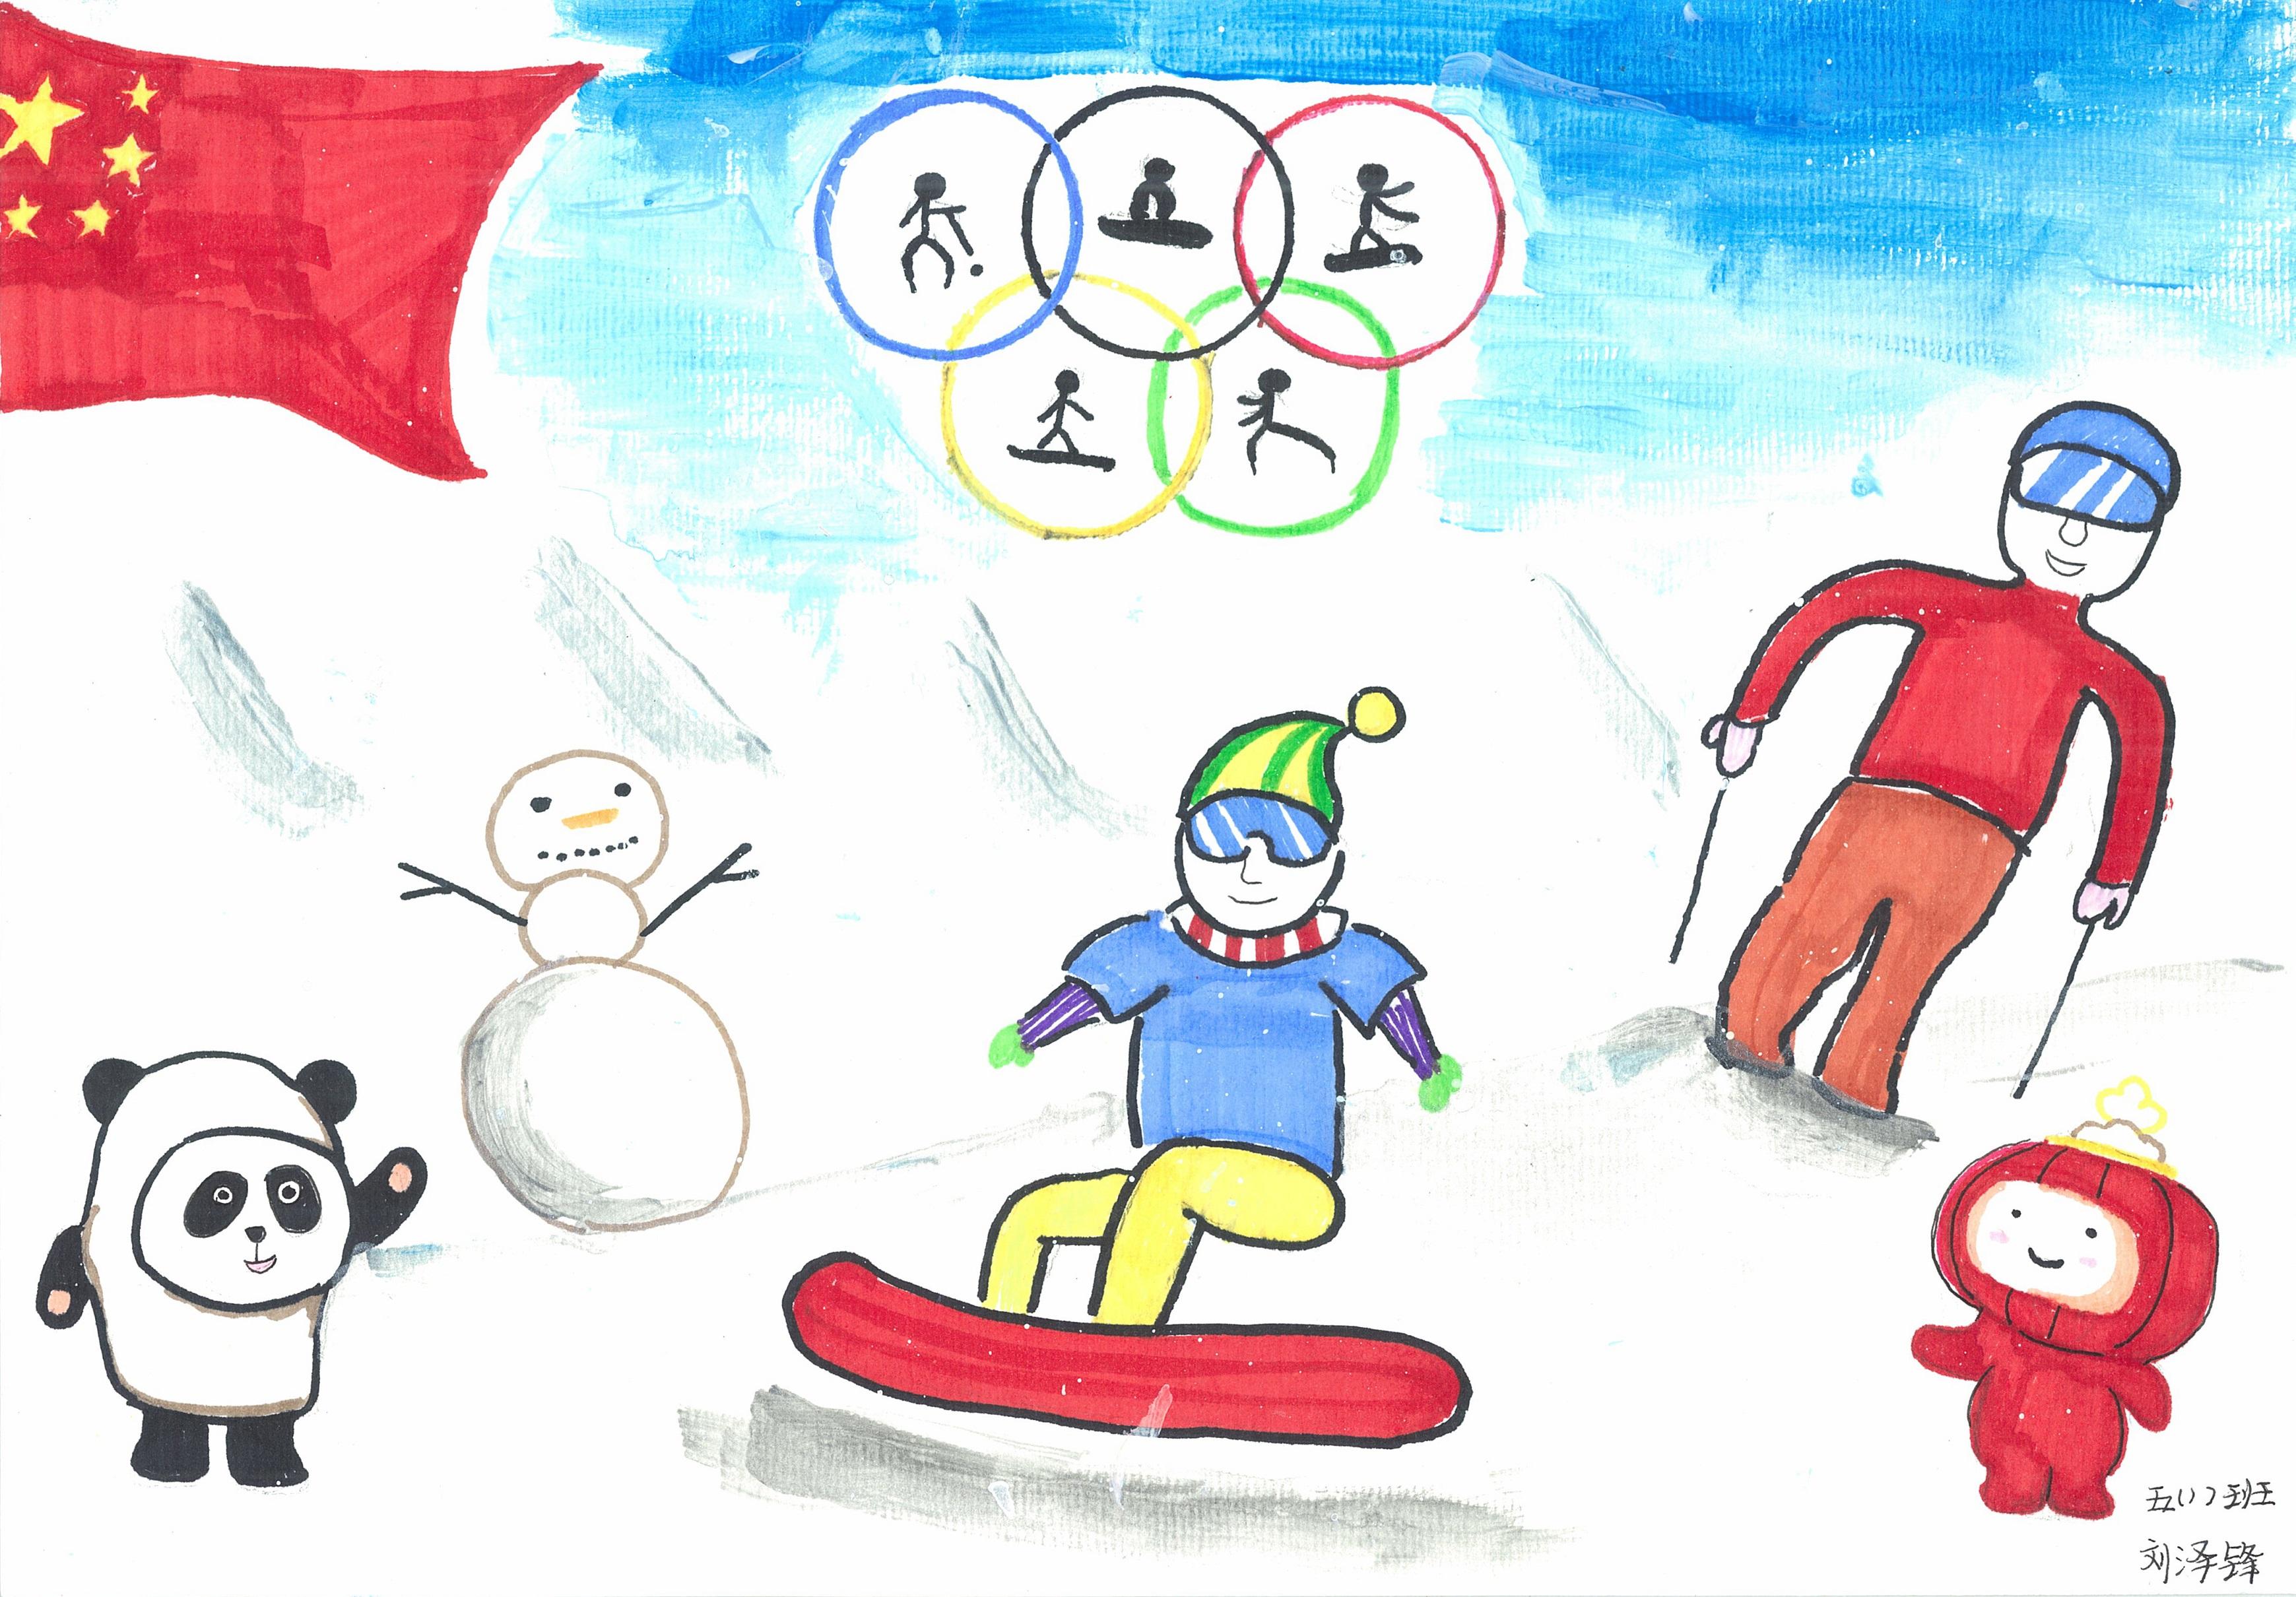 《我心中的冬奥荣耀时刻》Glory Moments Of The Winter Olympics In My Heart +刘泽锋 Liu Zefeng